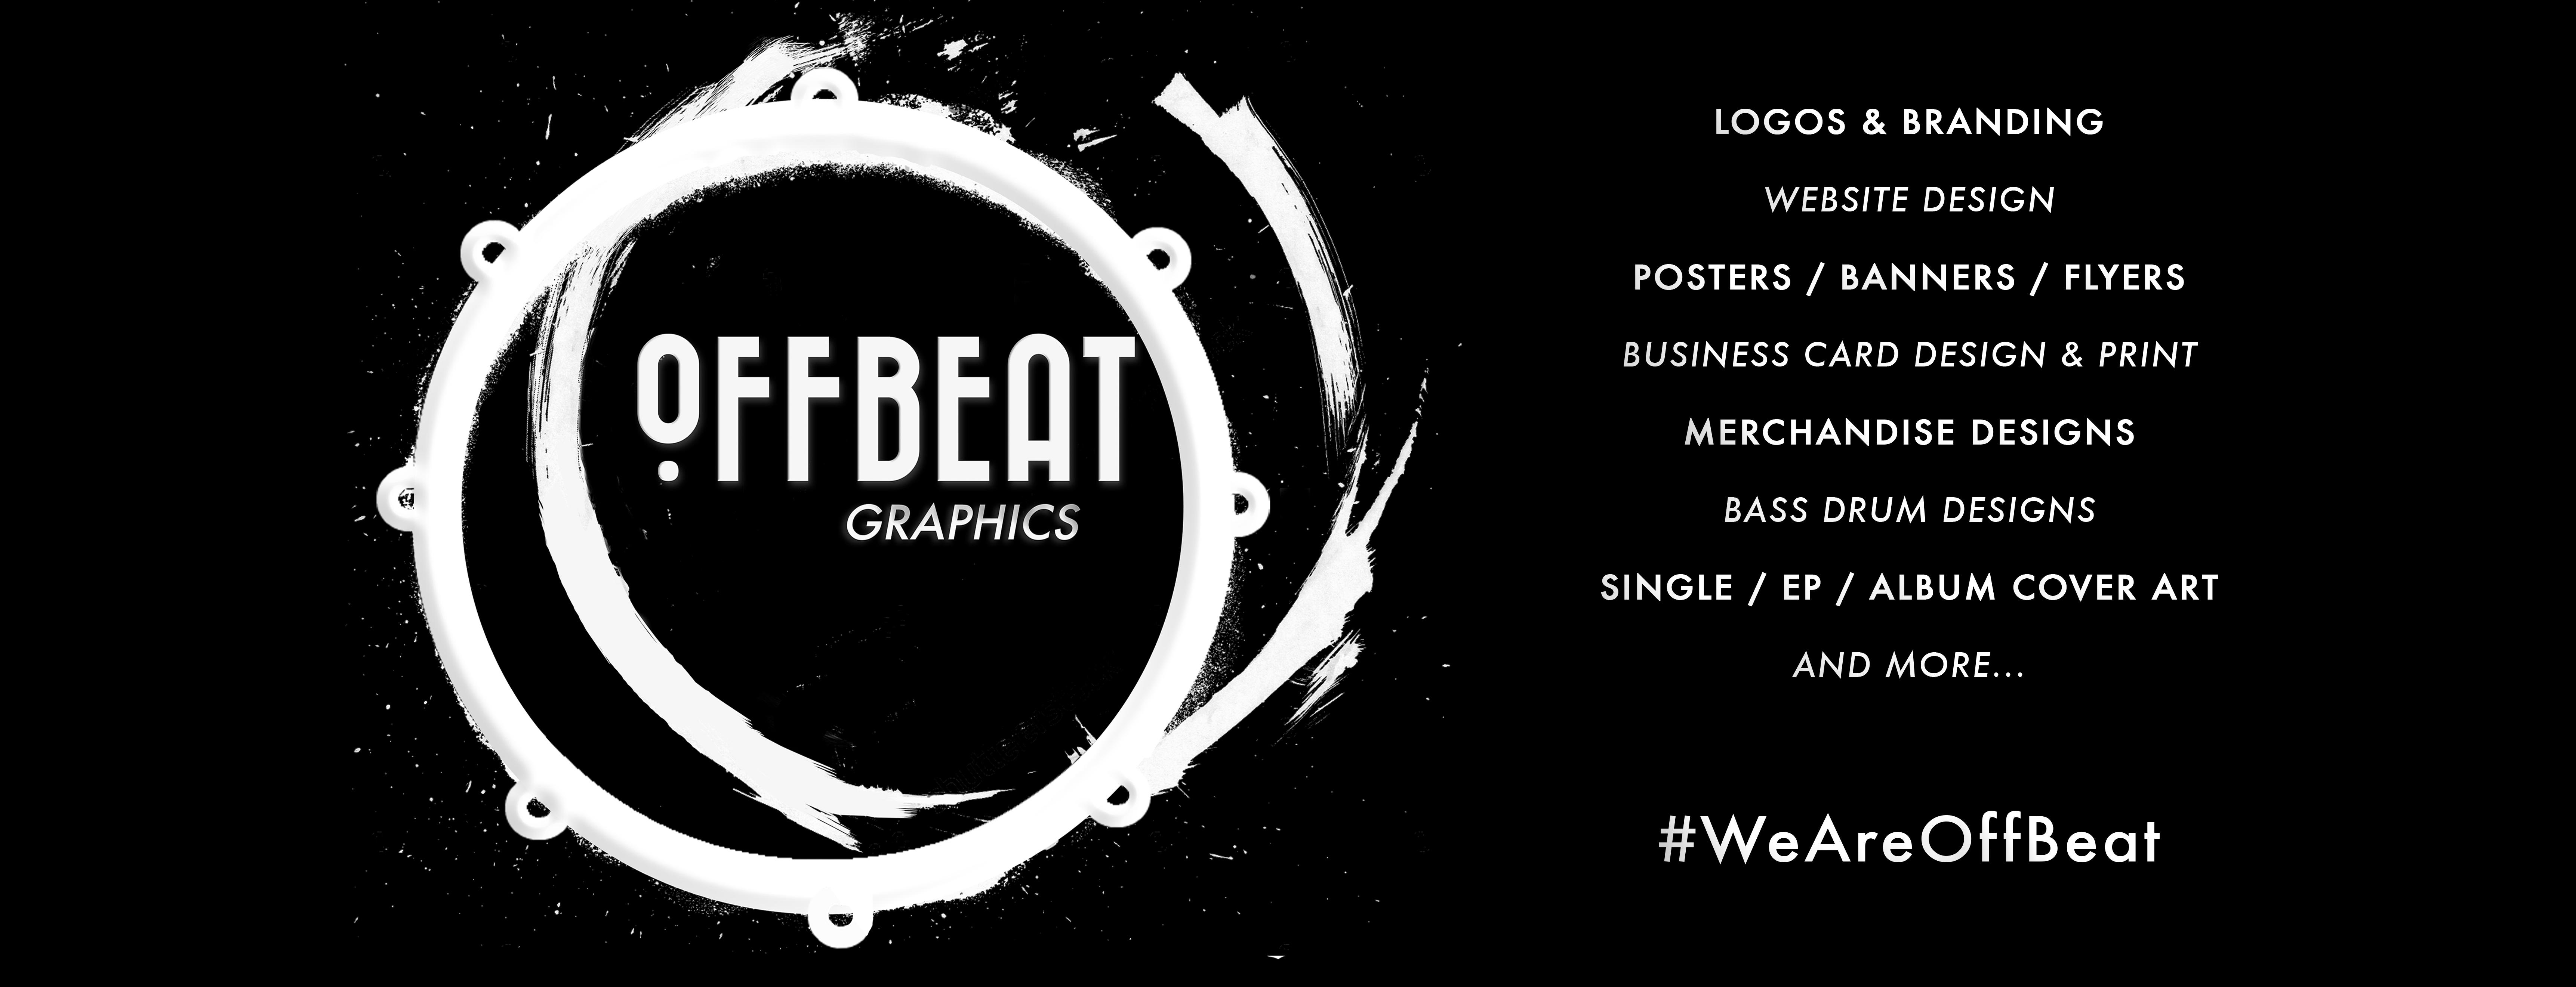 business card design print